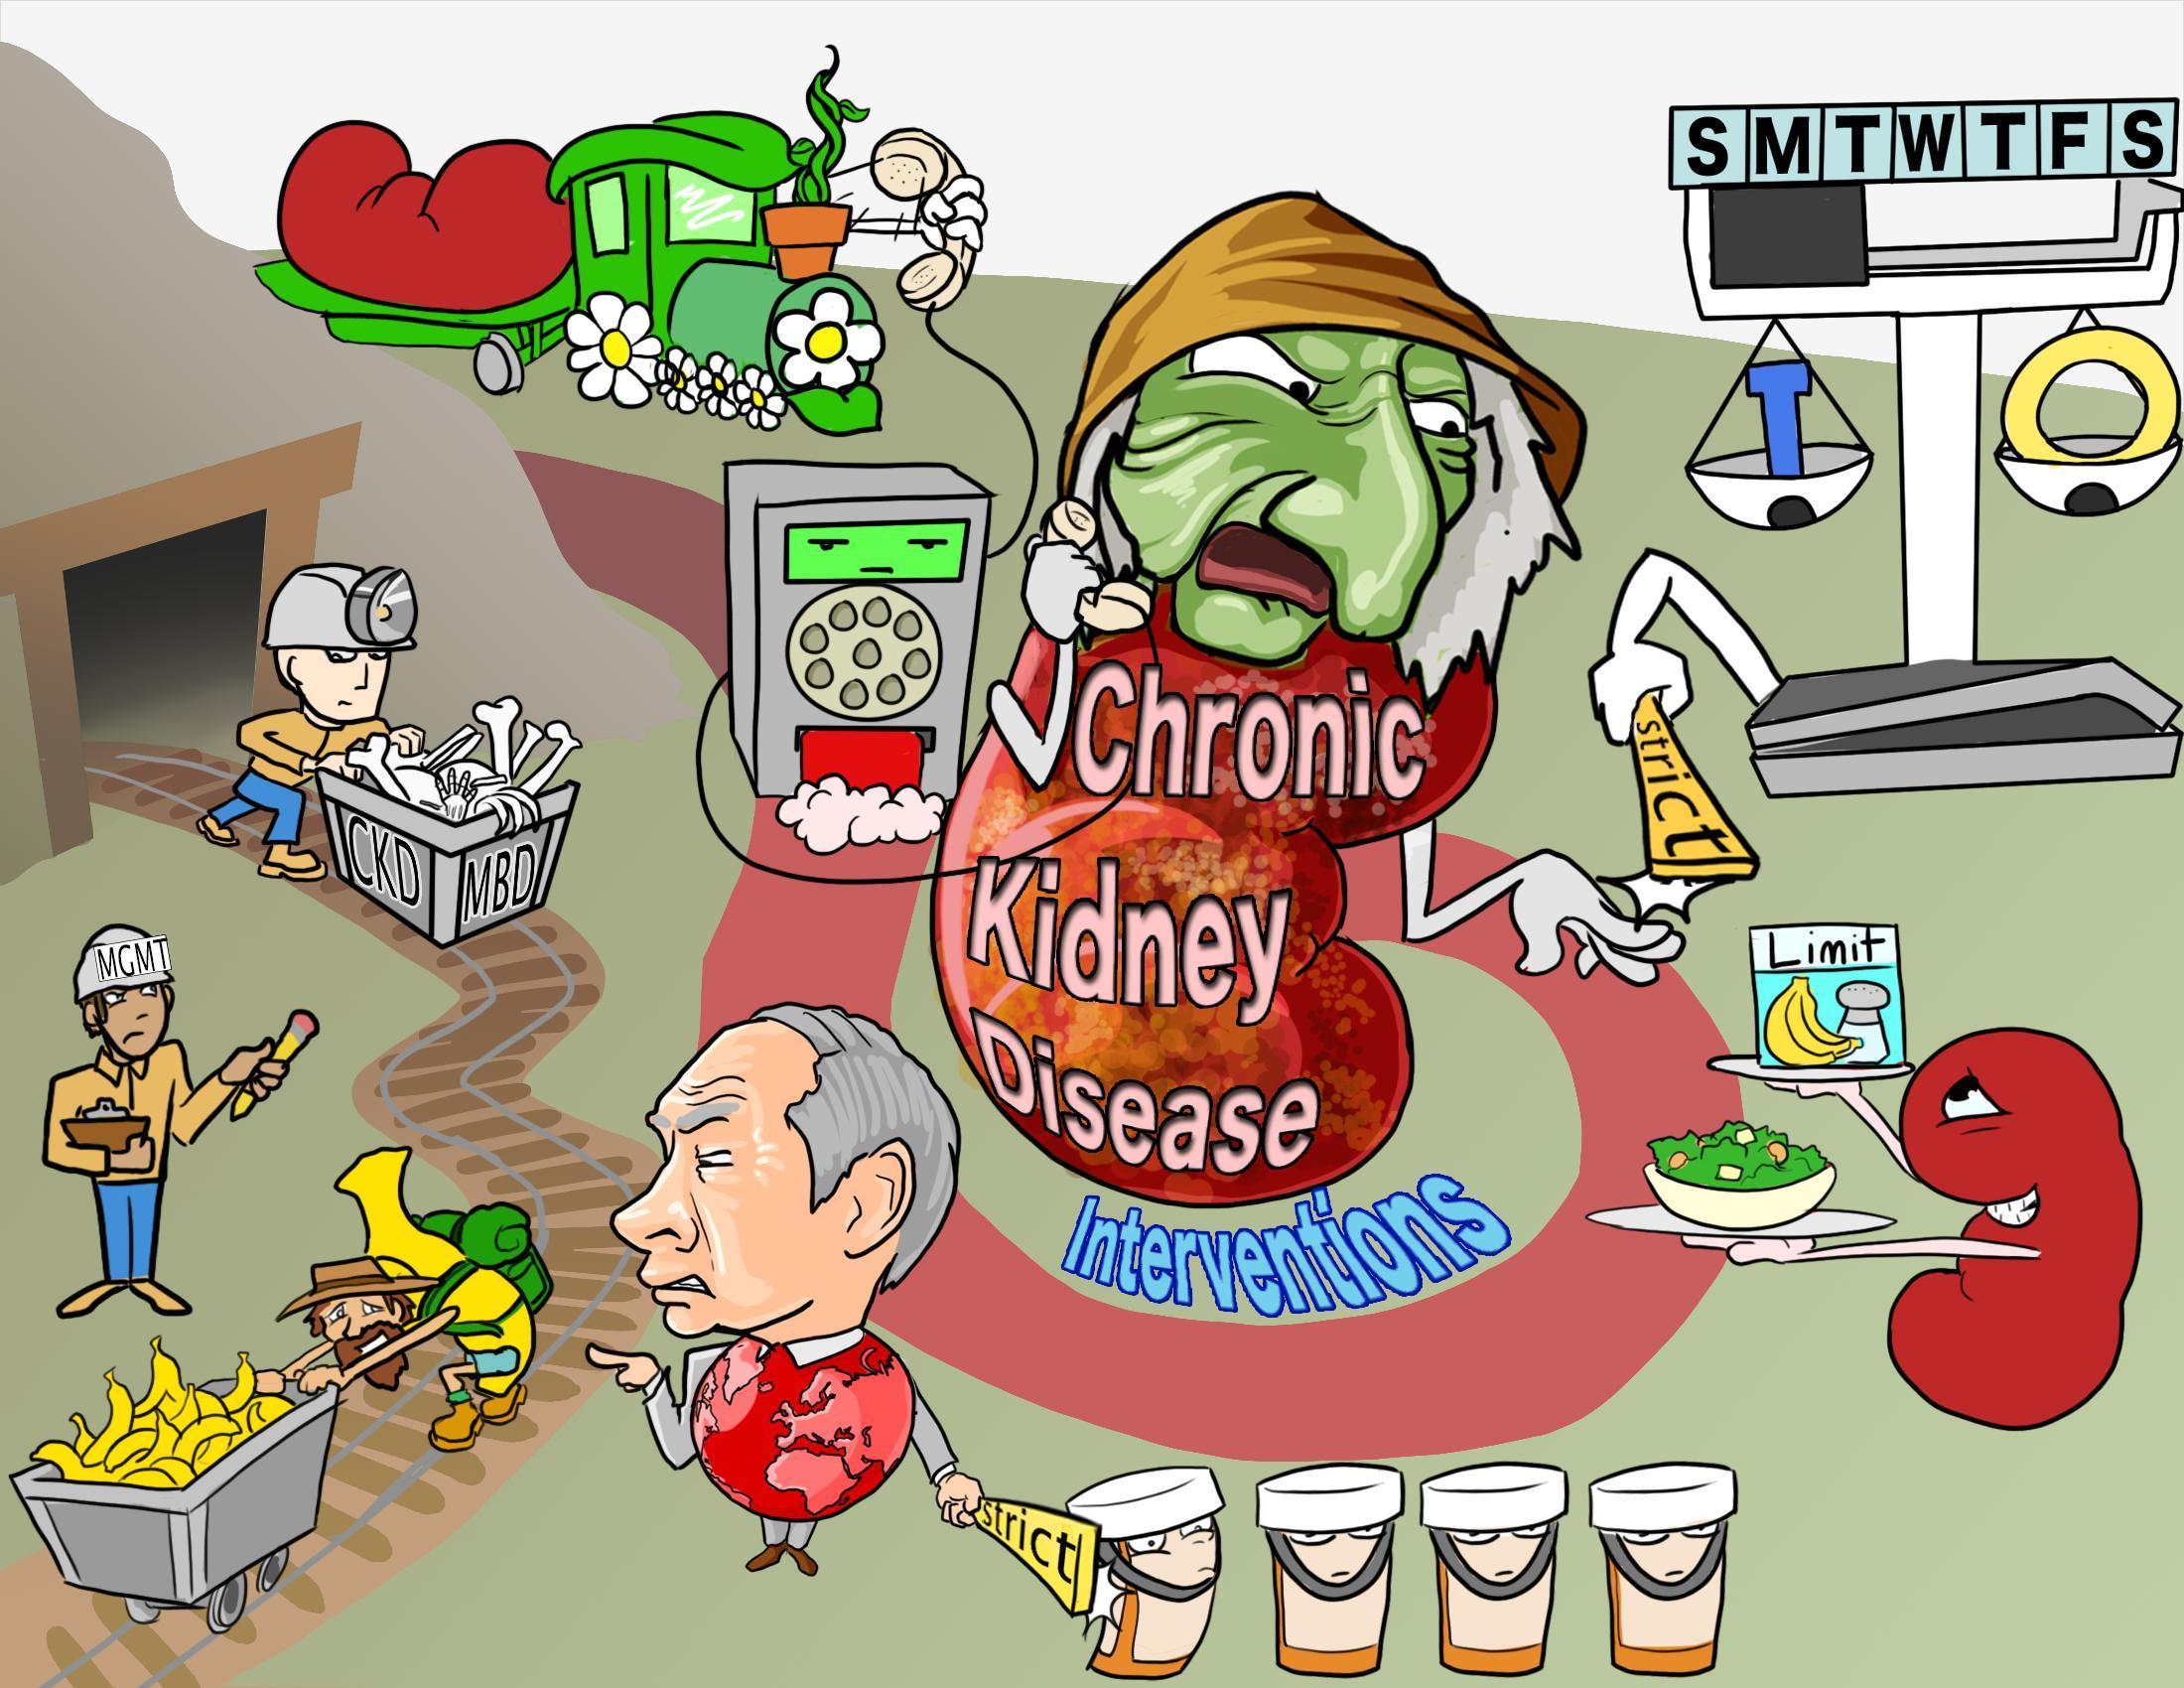 Chronic Kidney Disease Interventions